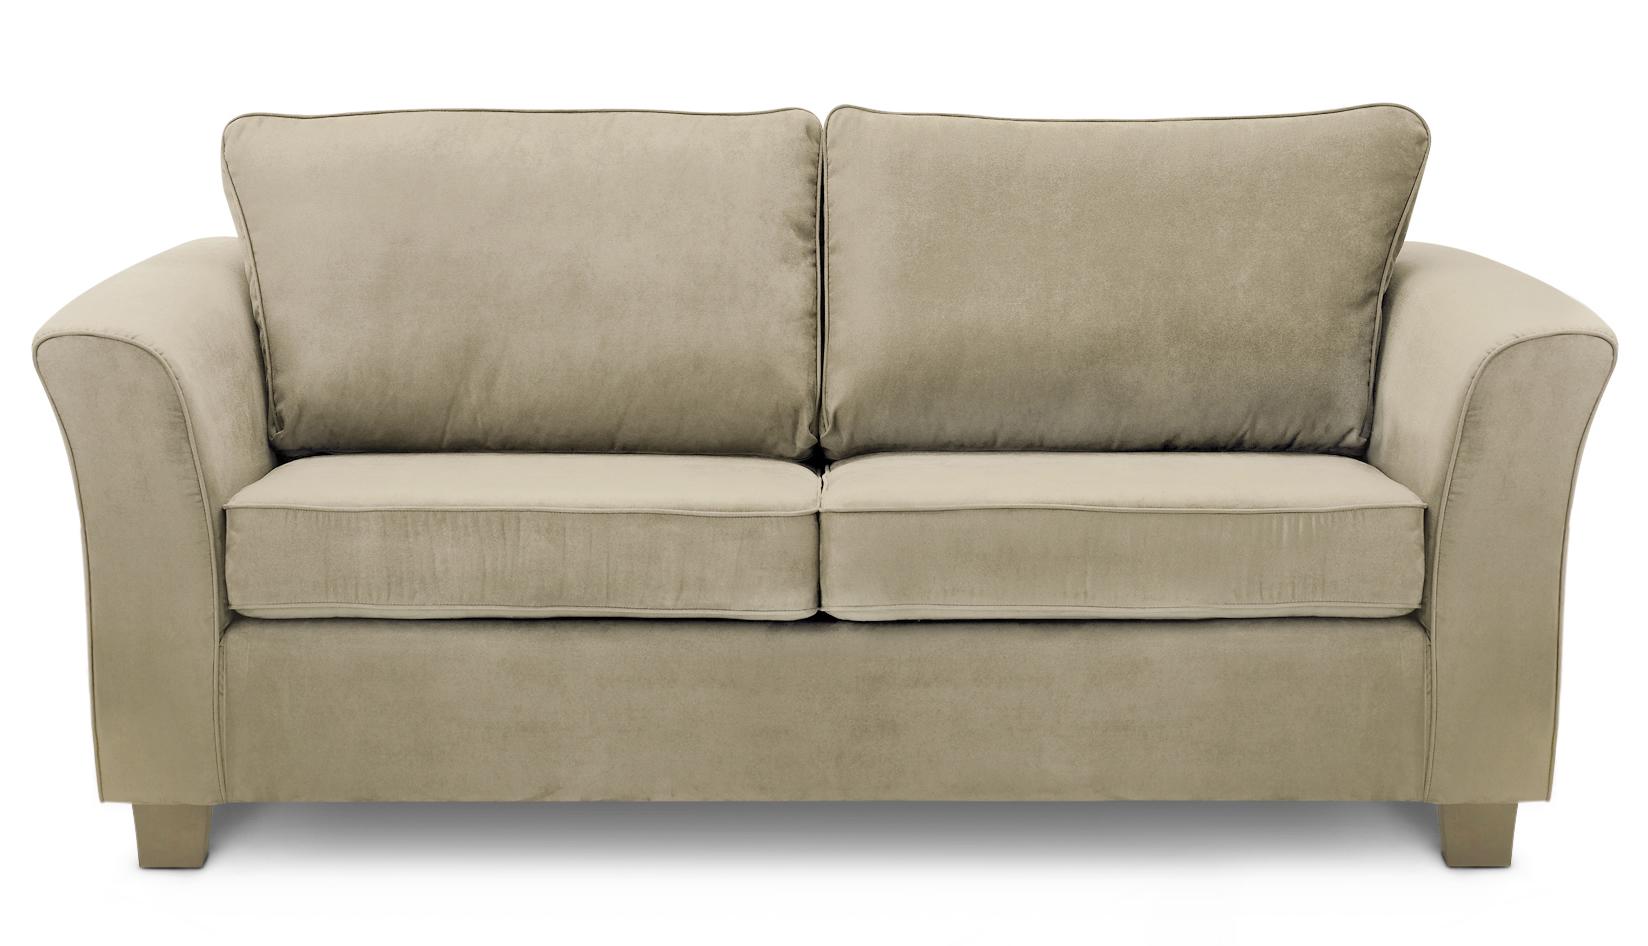 cream leather sofas on sale